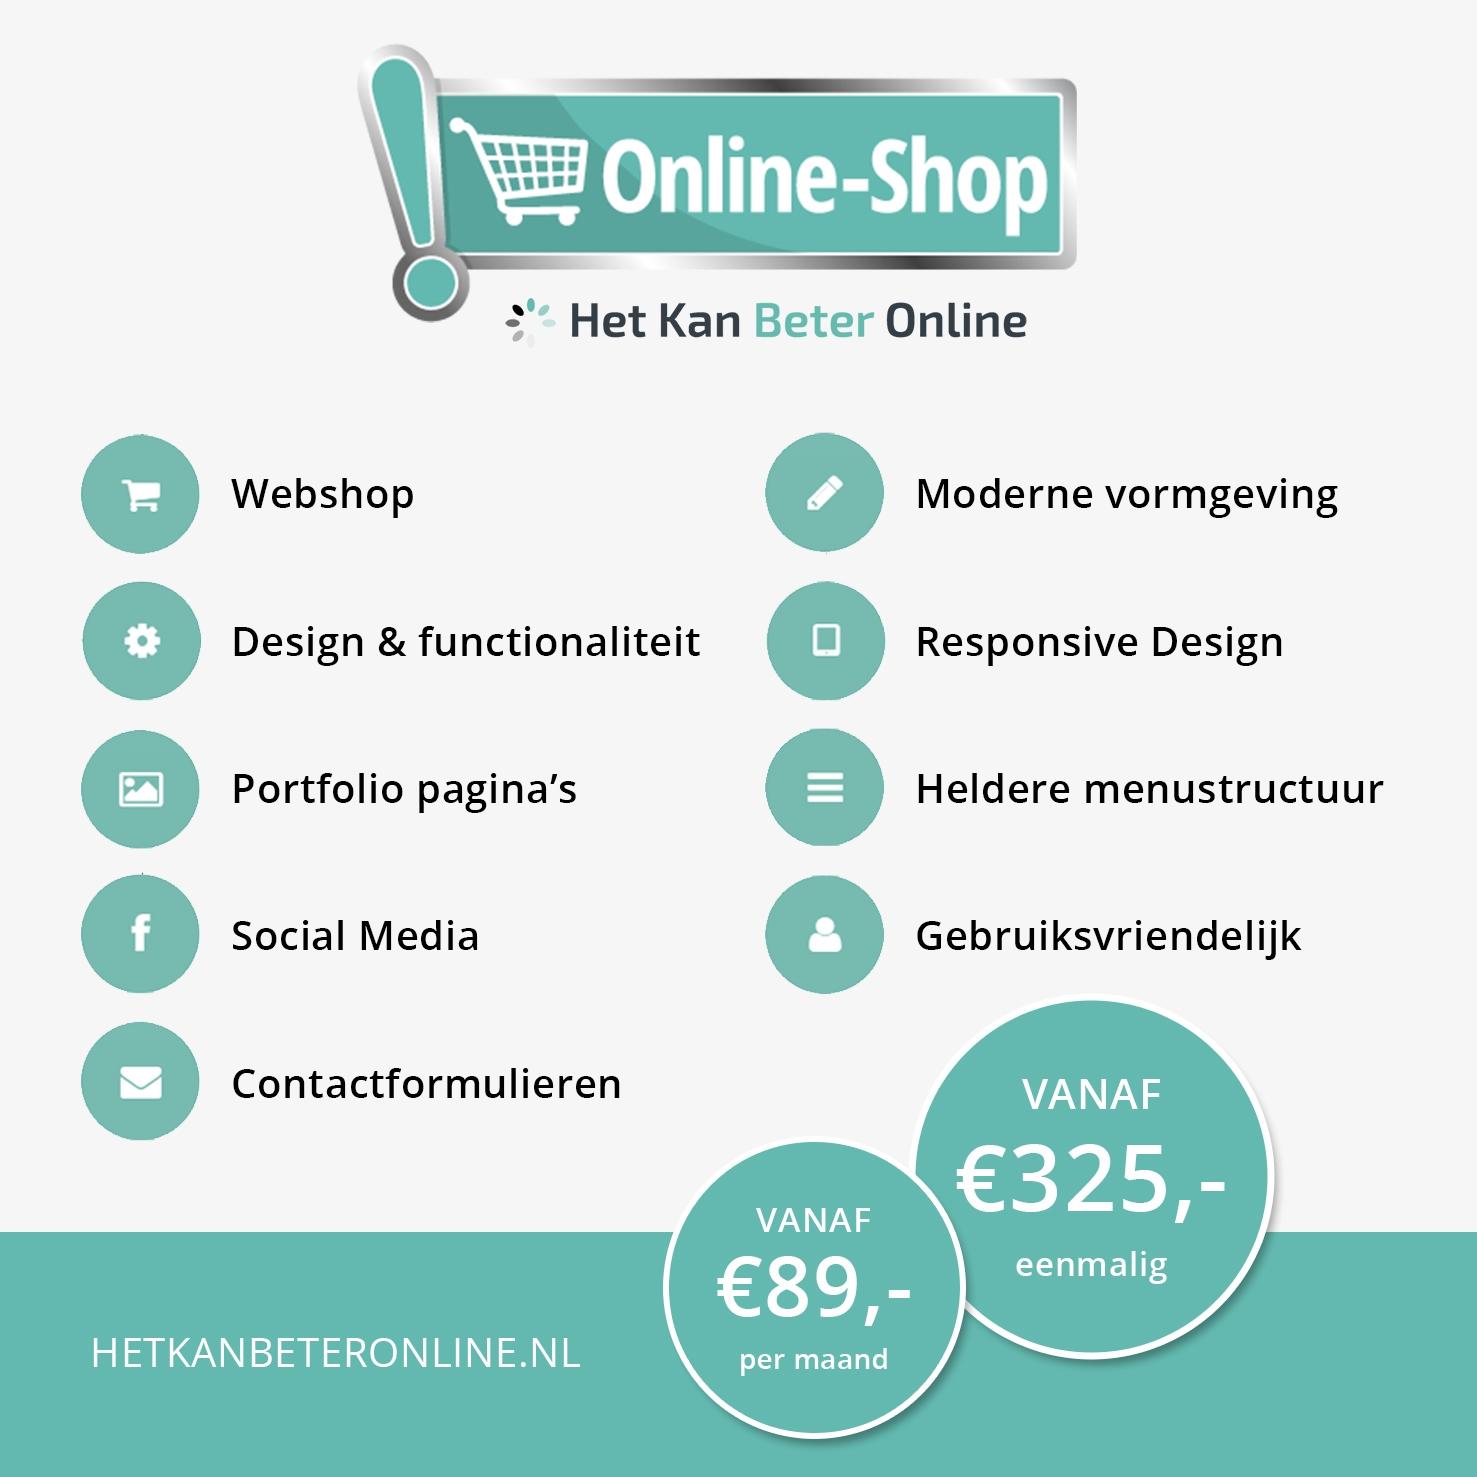 Webshop service Flevoland